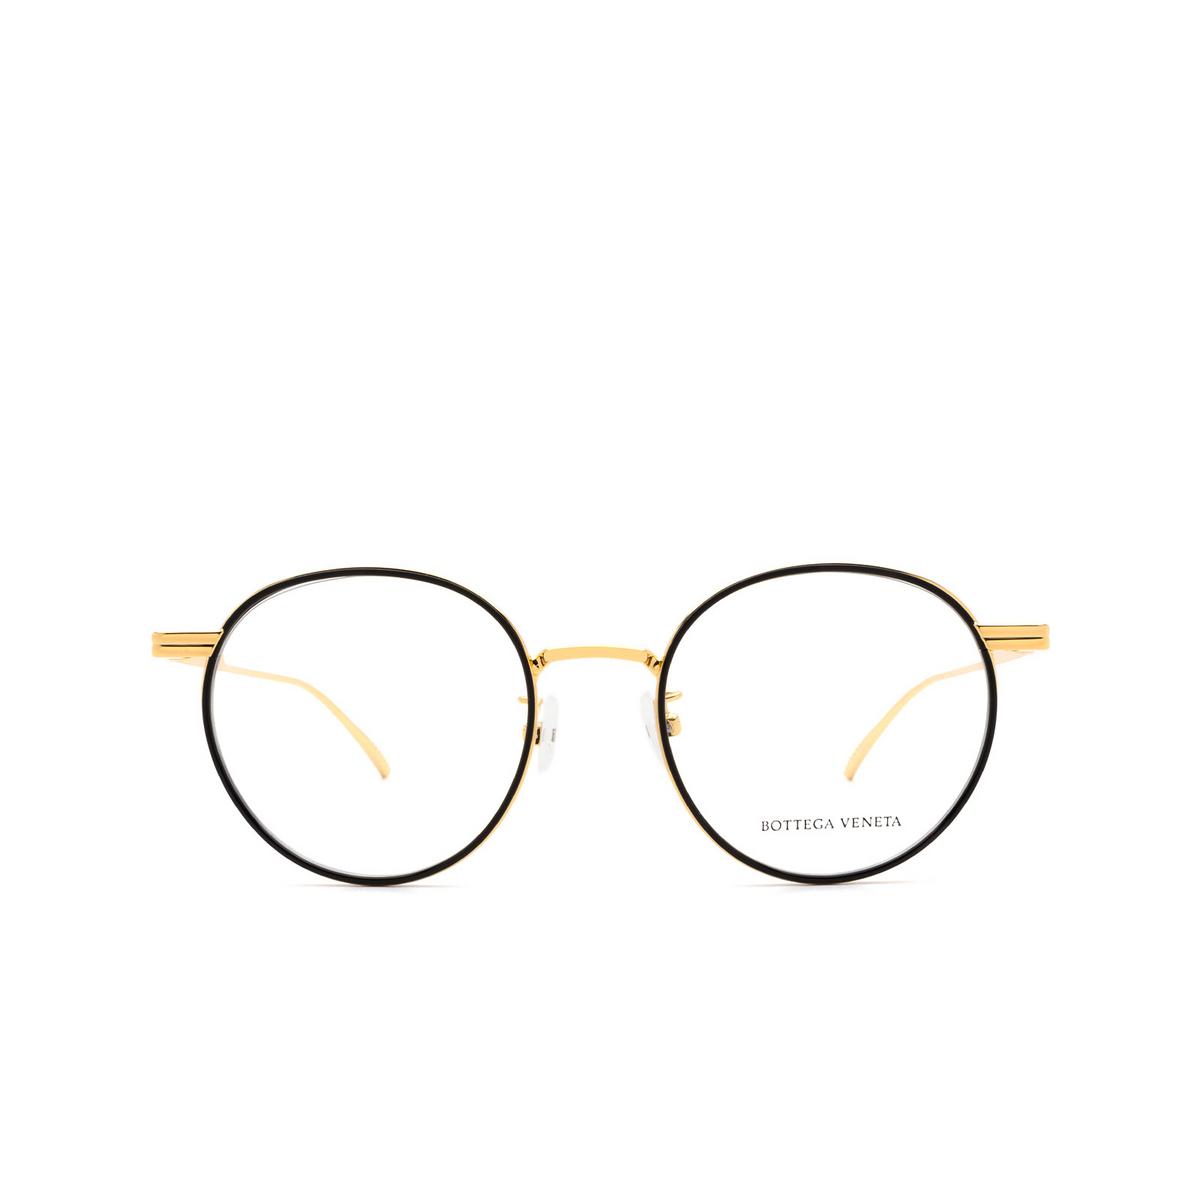 Bottega Veneta® Round Eyeglasses: BV1017O color Black & Gold 001 - front view.